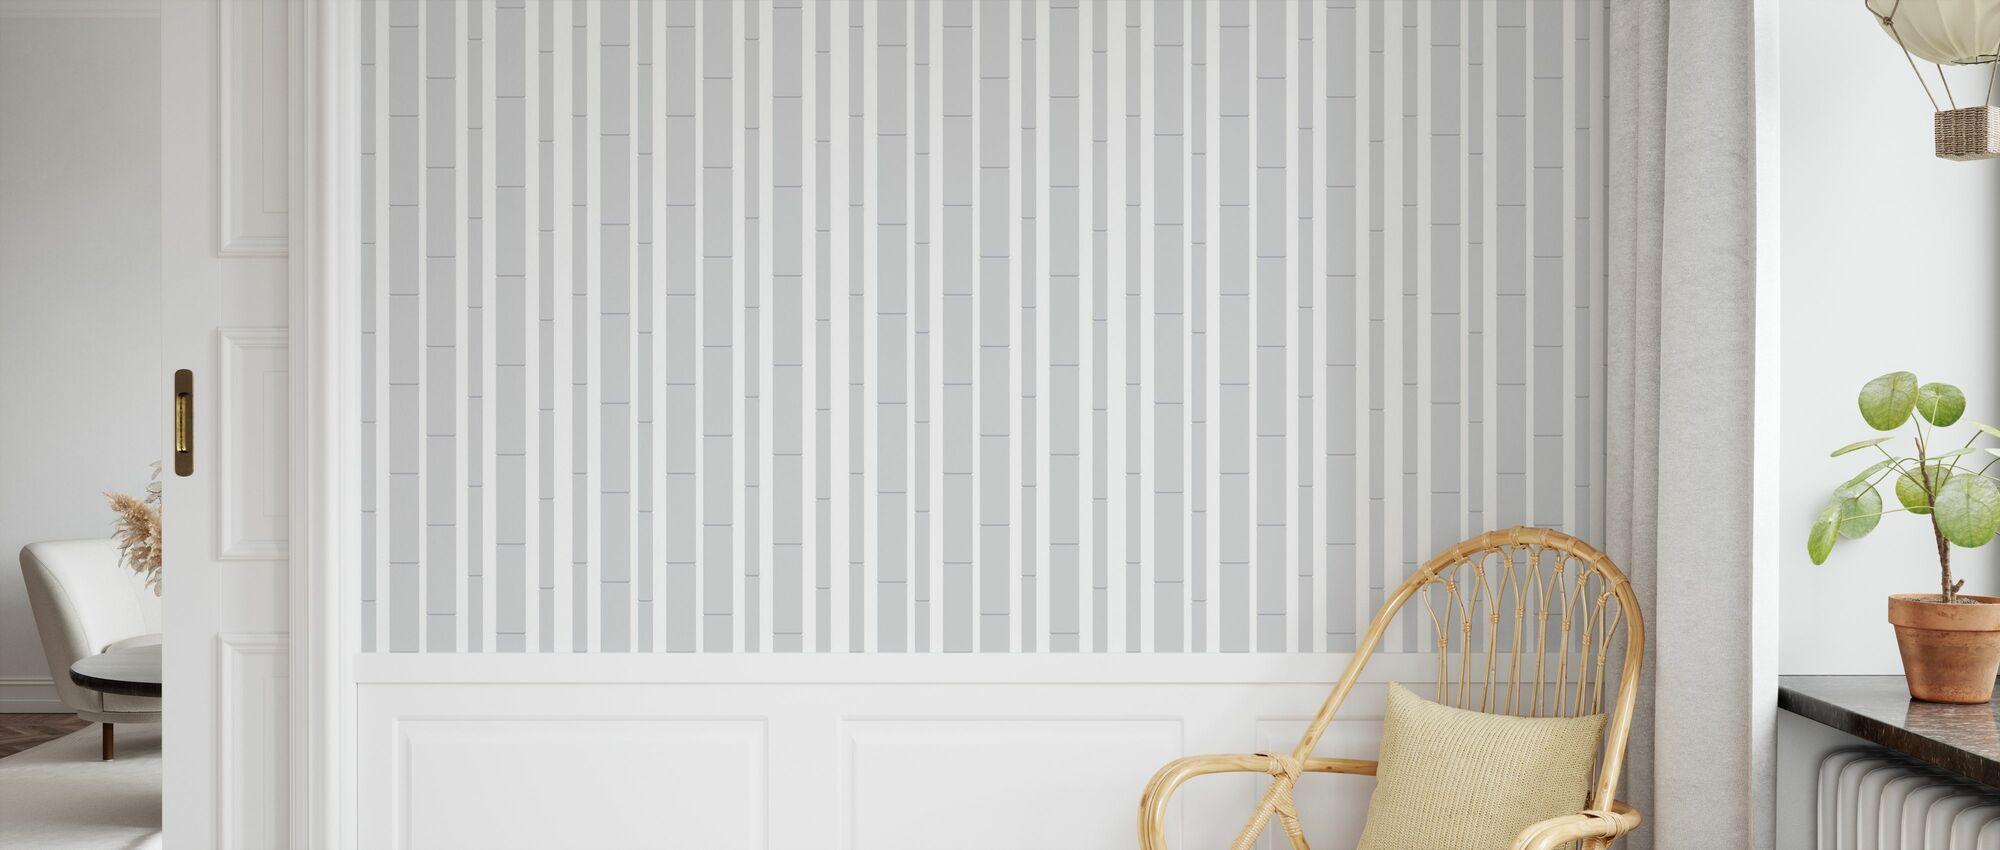 Bamboo - Grey - Wallpaper - Kids Room